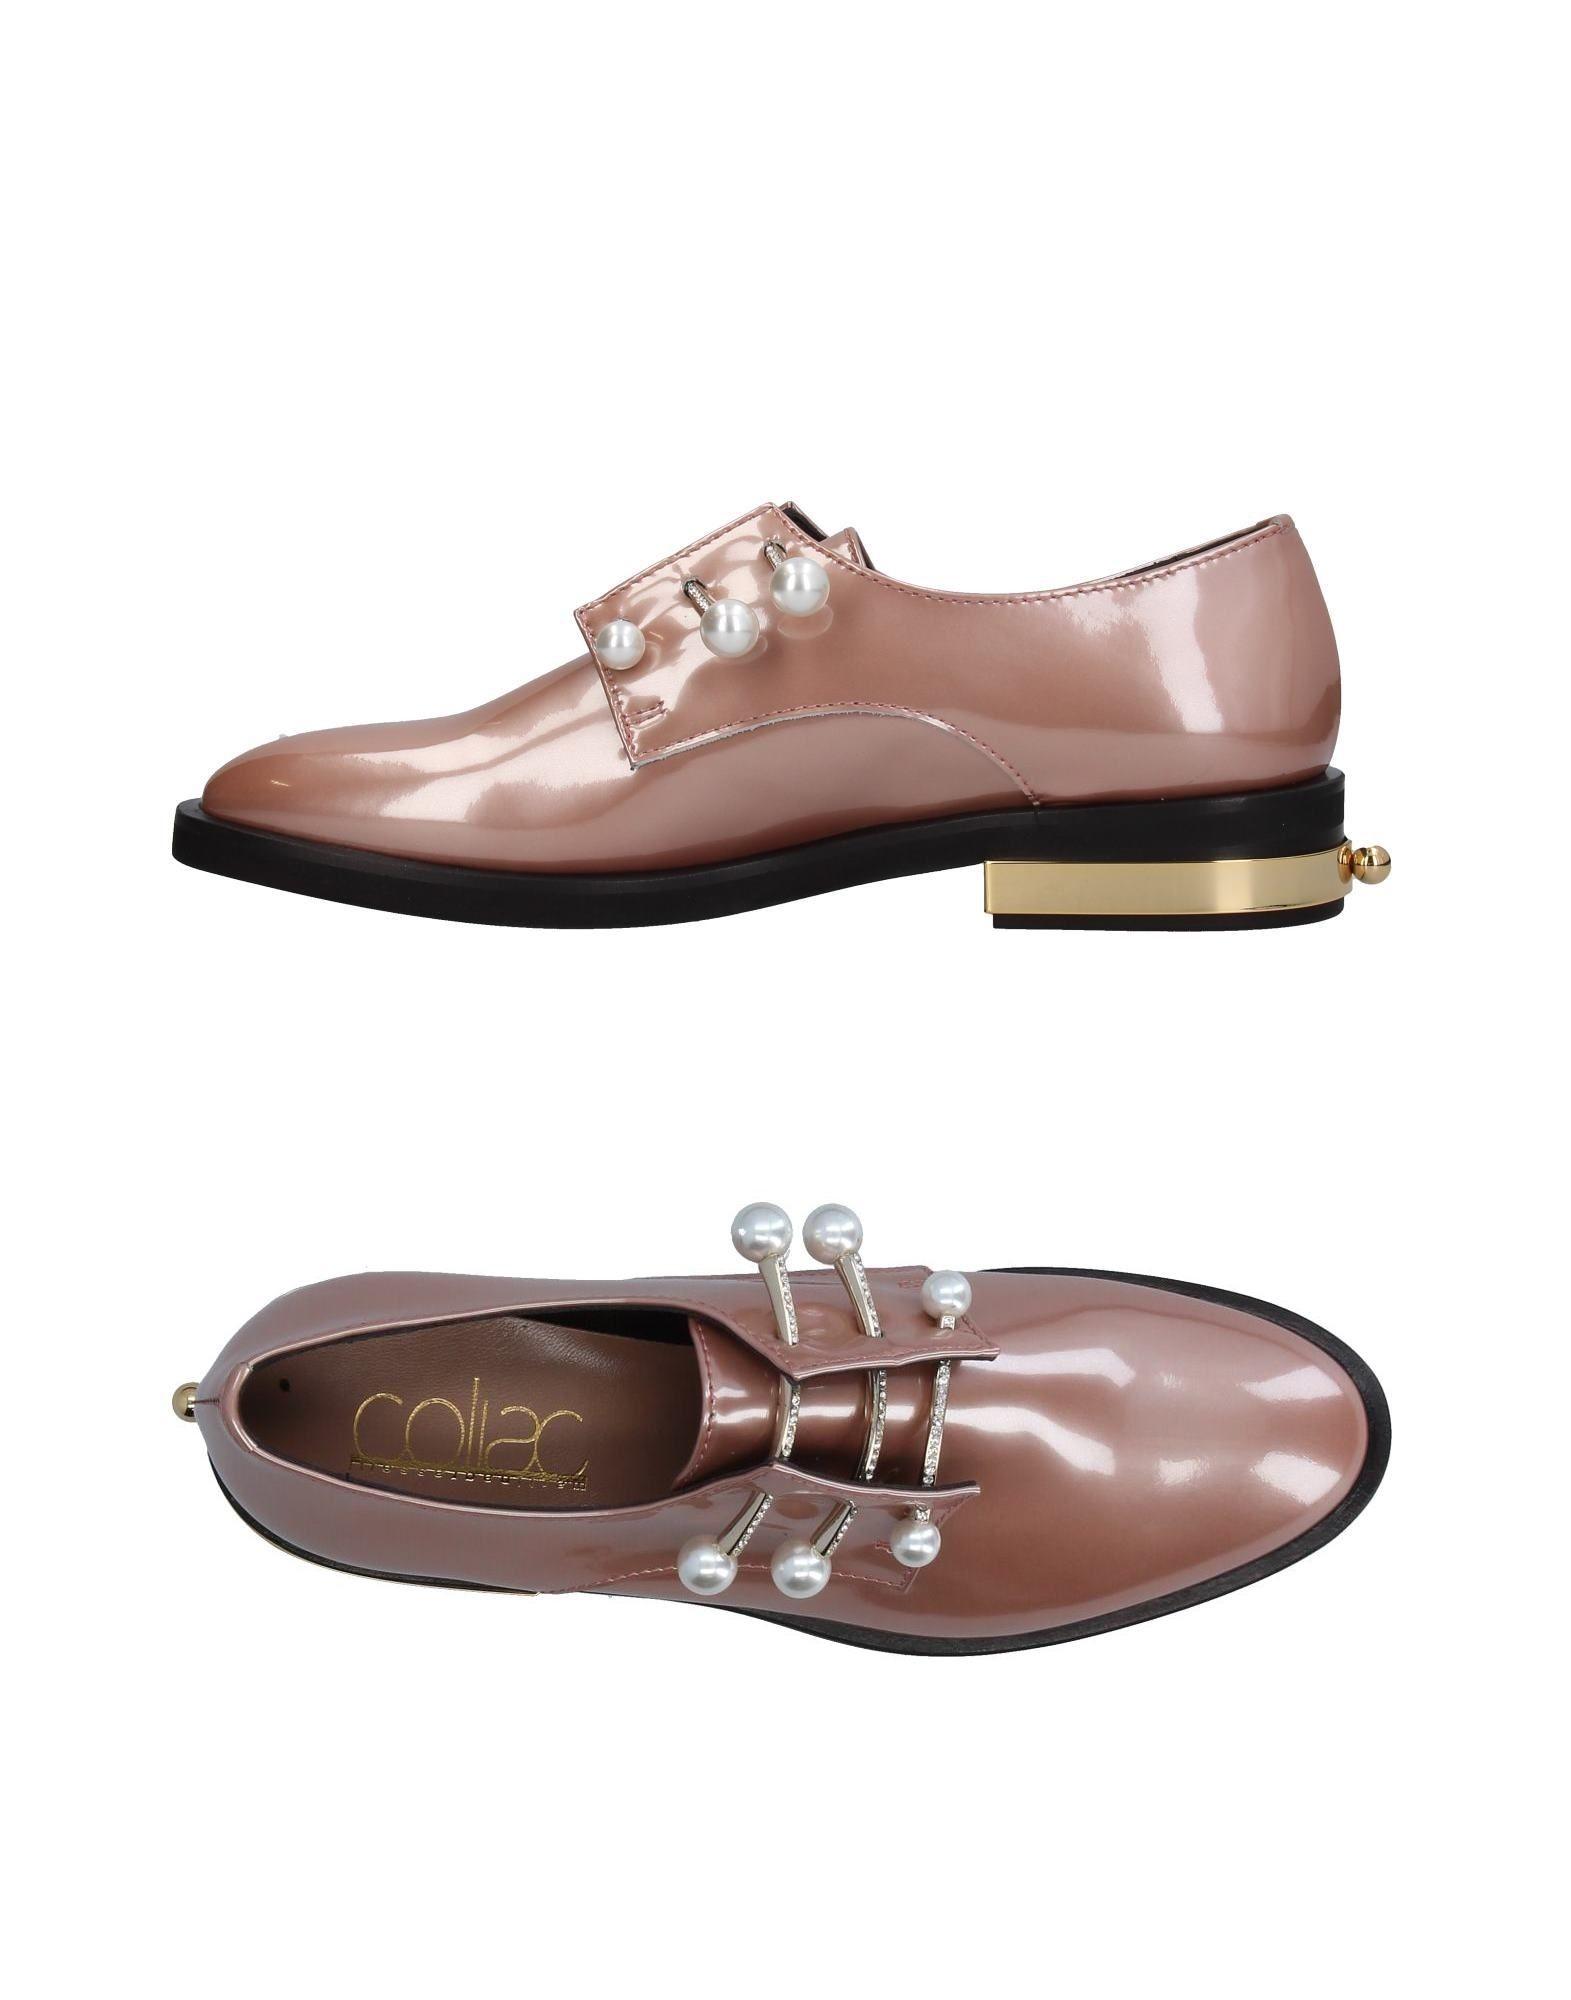 Coliac Martina Grasselli Mokassins aussehende Damen  11355208ONGünstige gut aussehende Mokassins Schuhe 607375